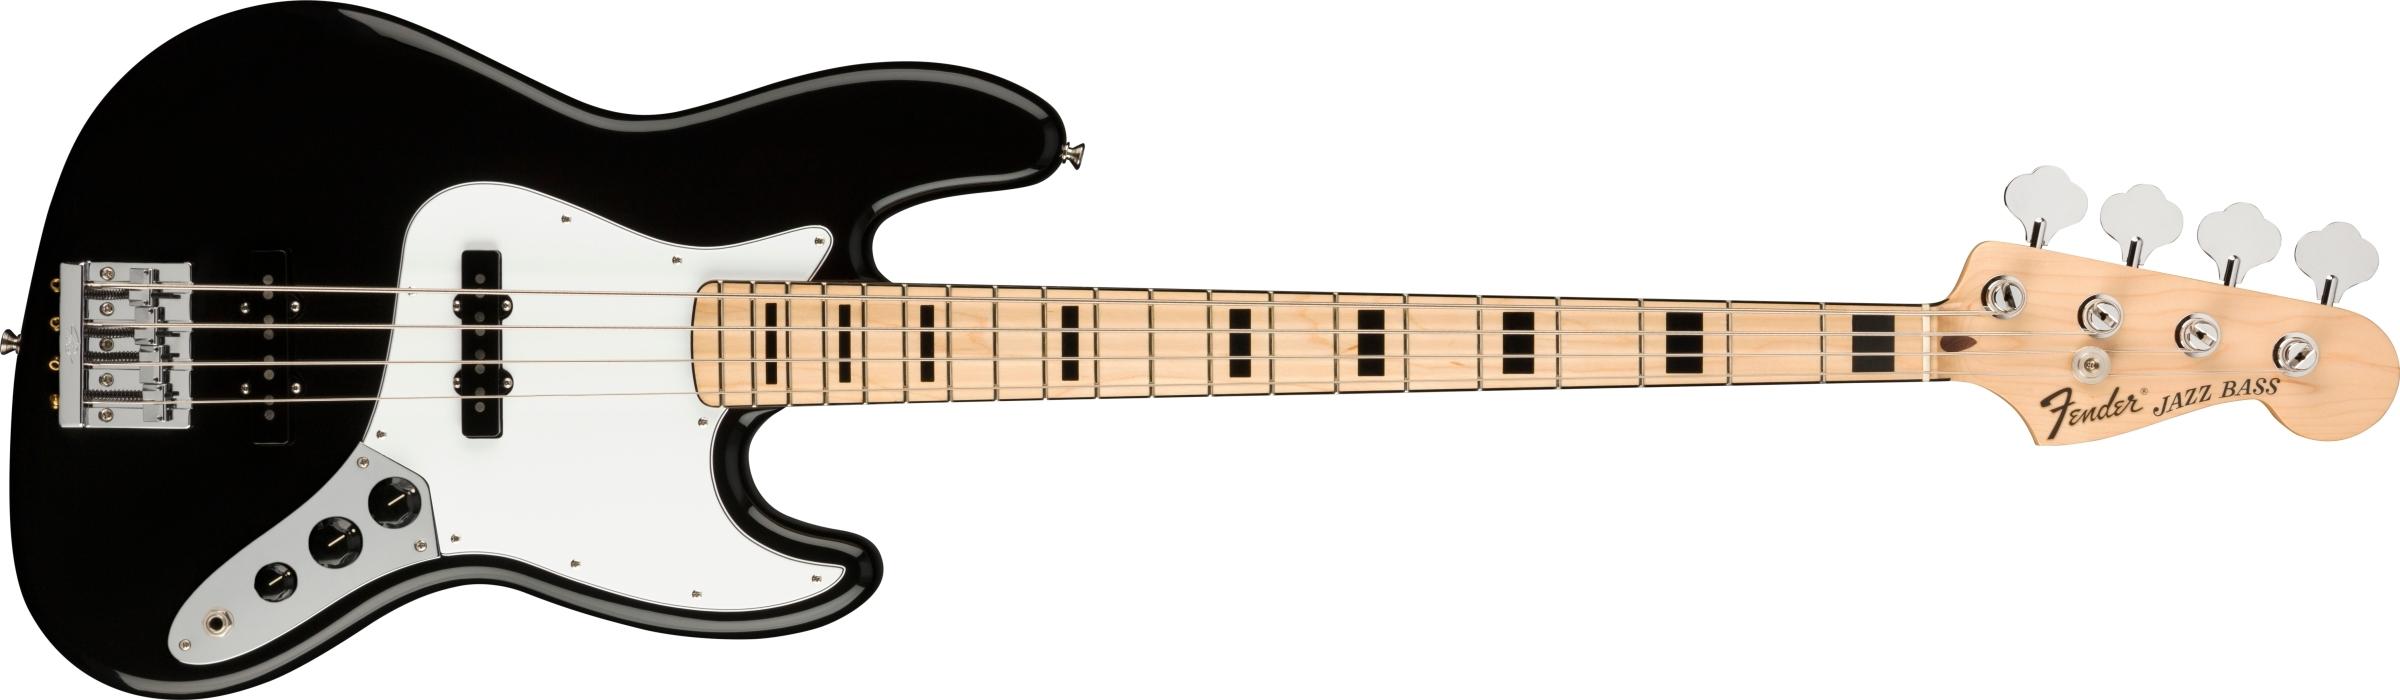 Fender American Deluxe Jazz Bass 5String Test